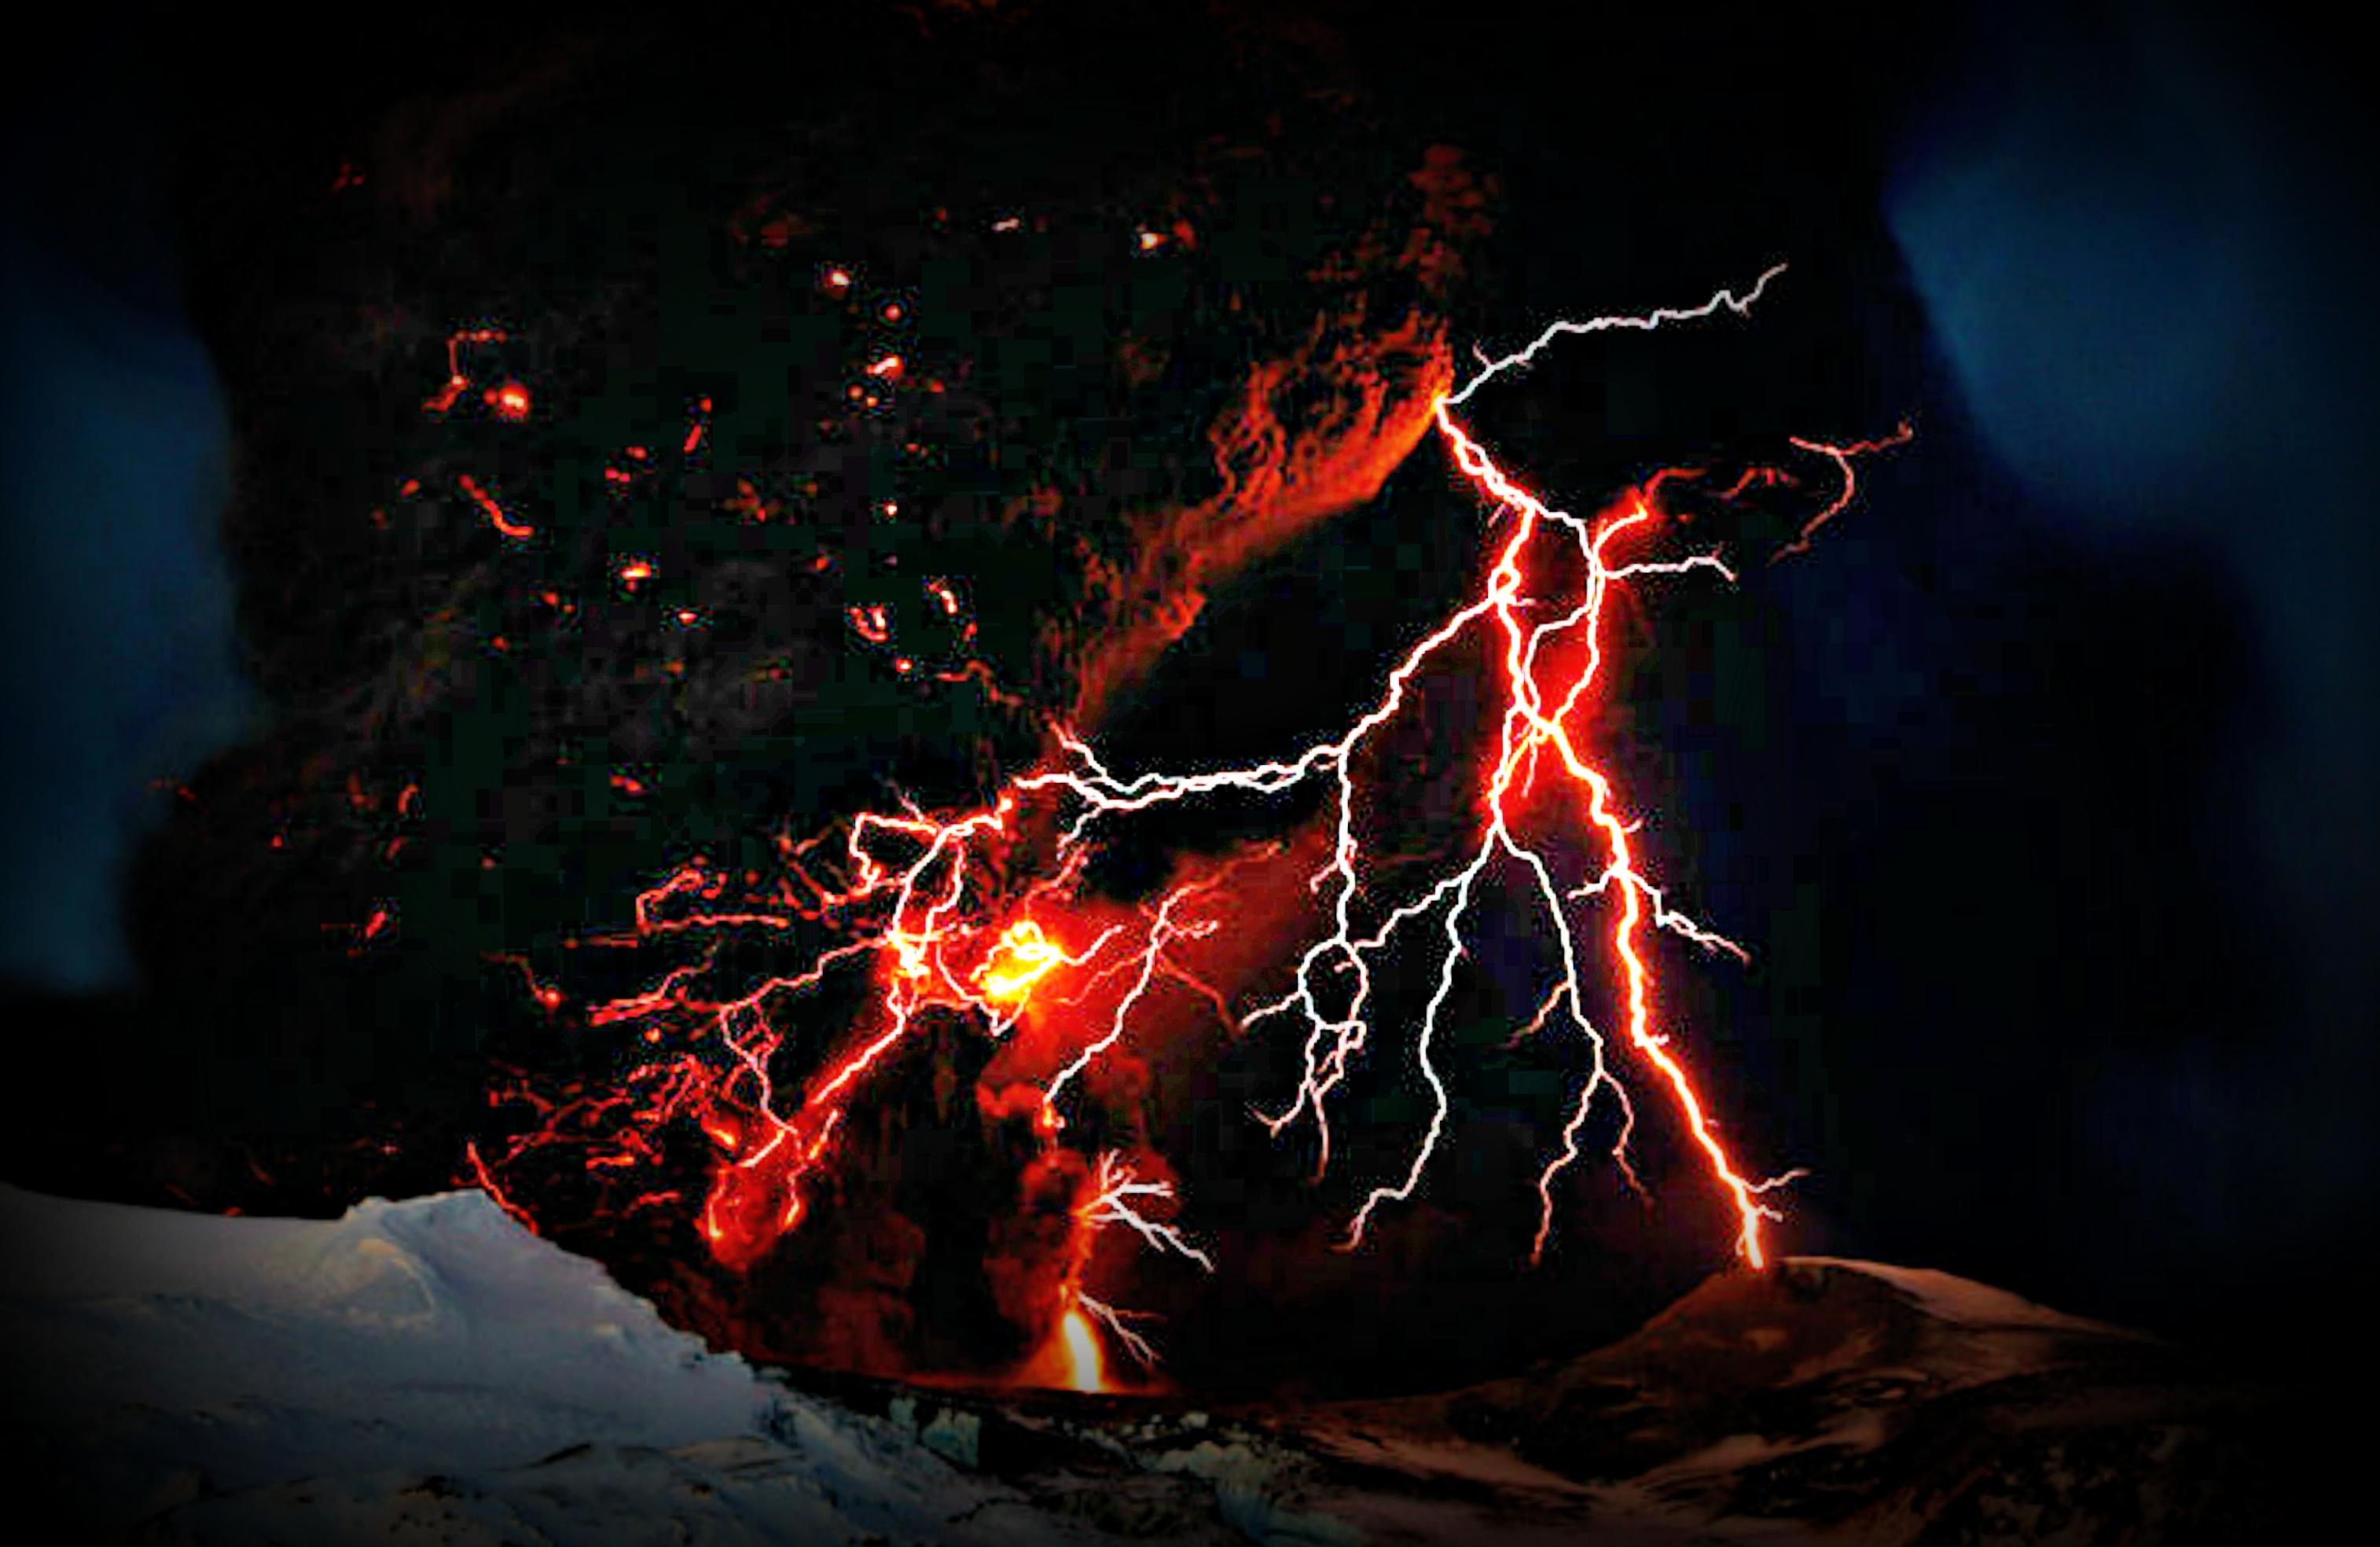 Res: 3028x1968, Lightning Wallpaper Unique Volcanic Lightning Wallpaper 64 Images